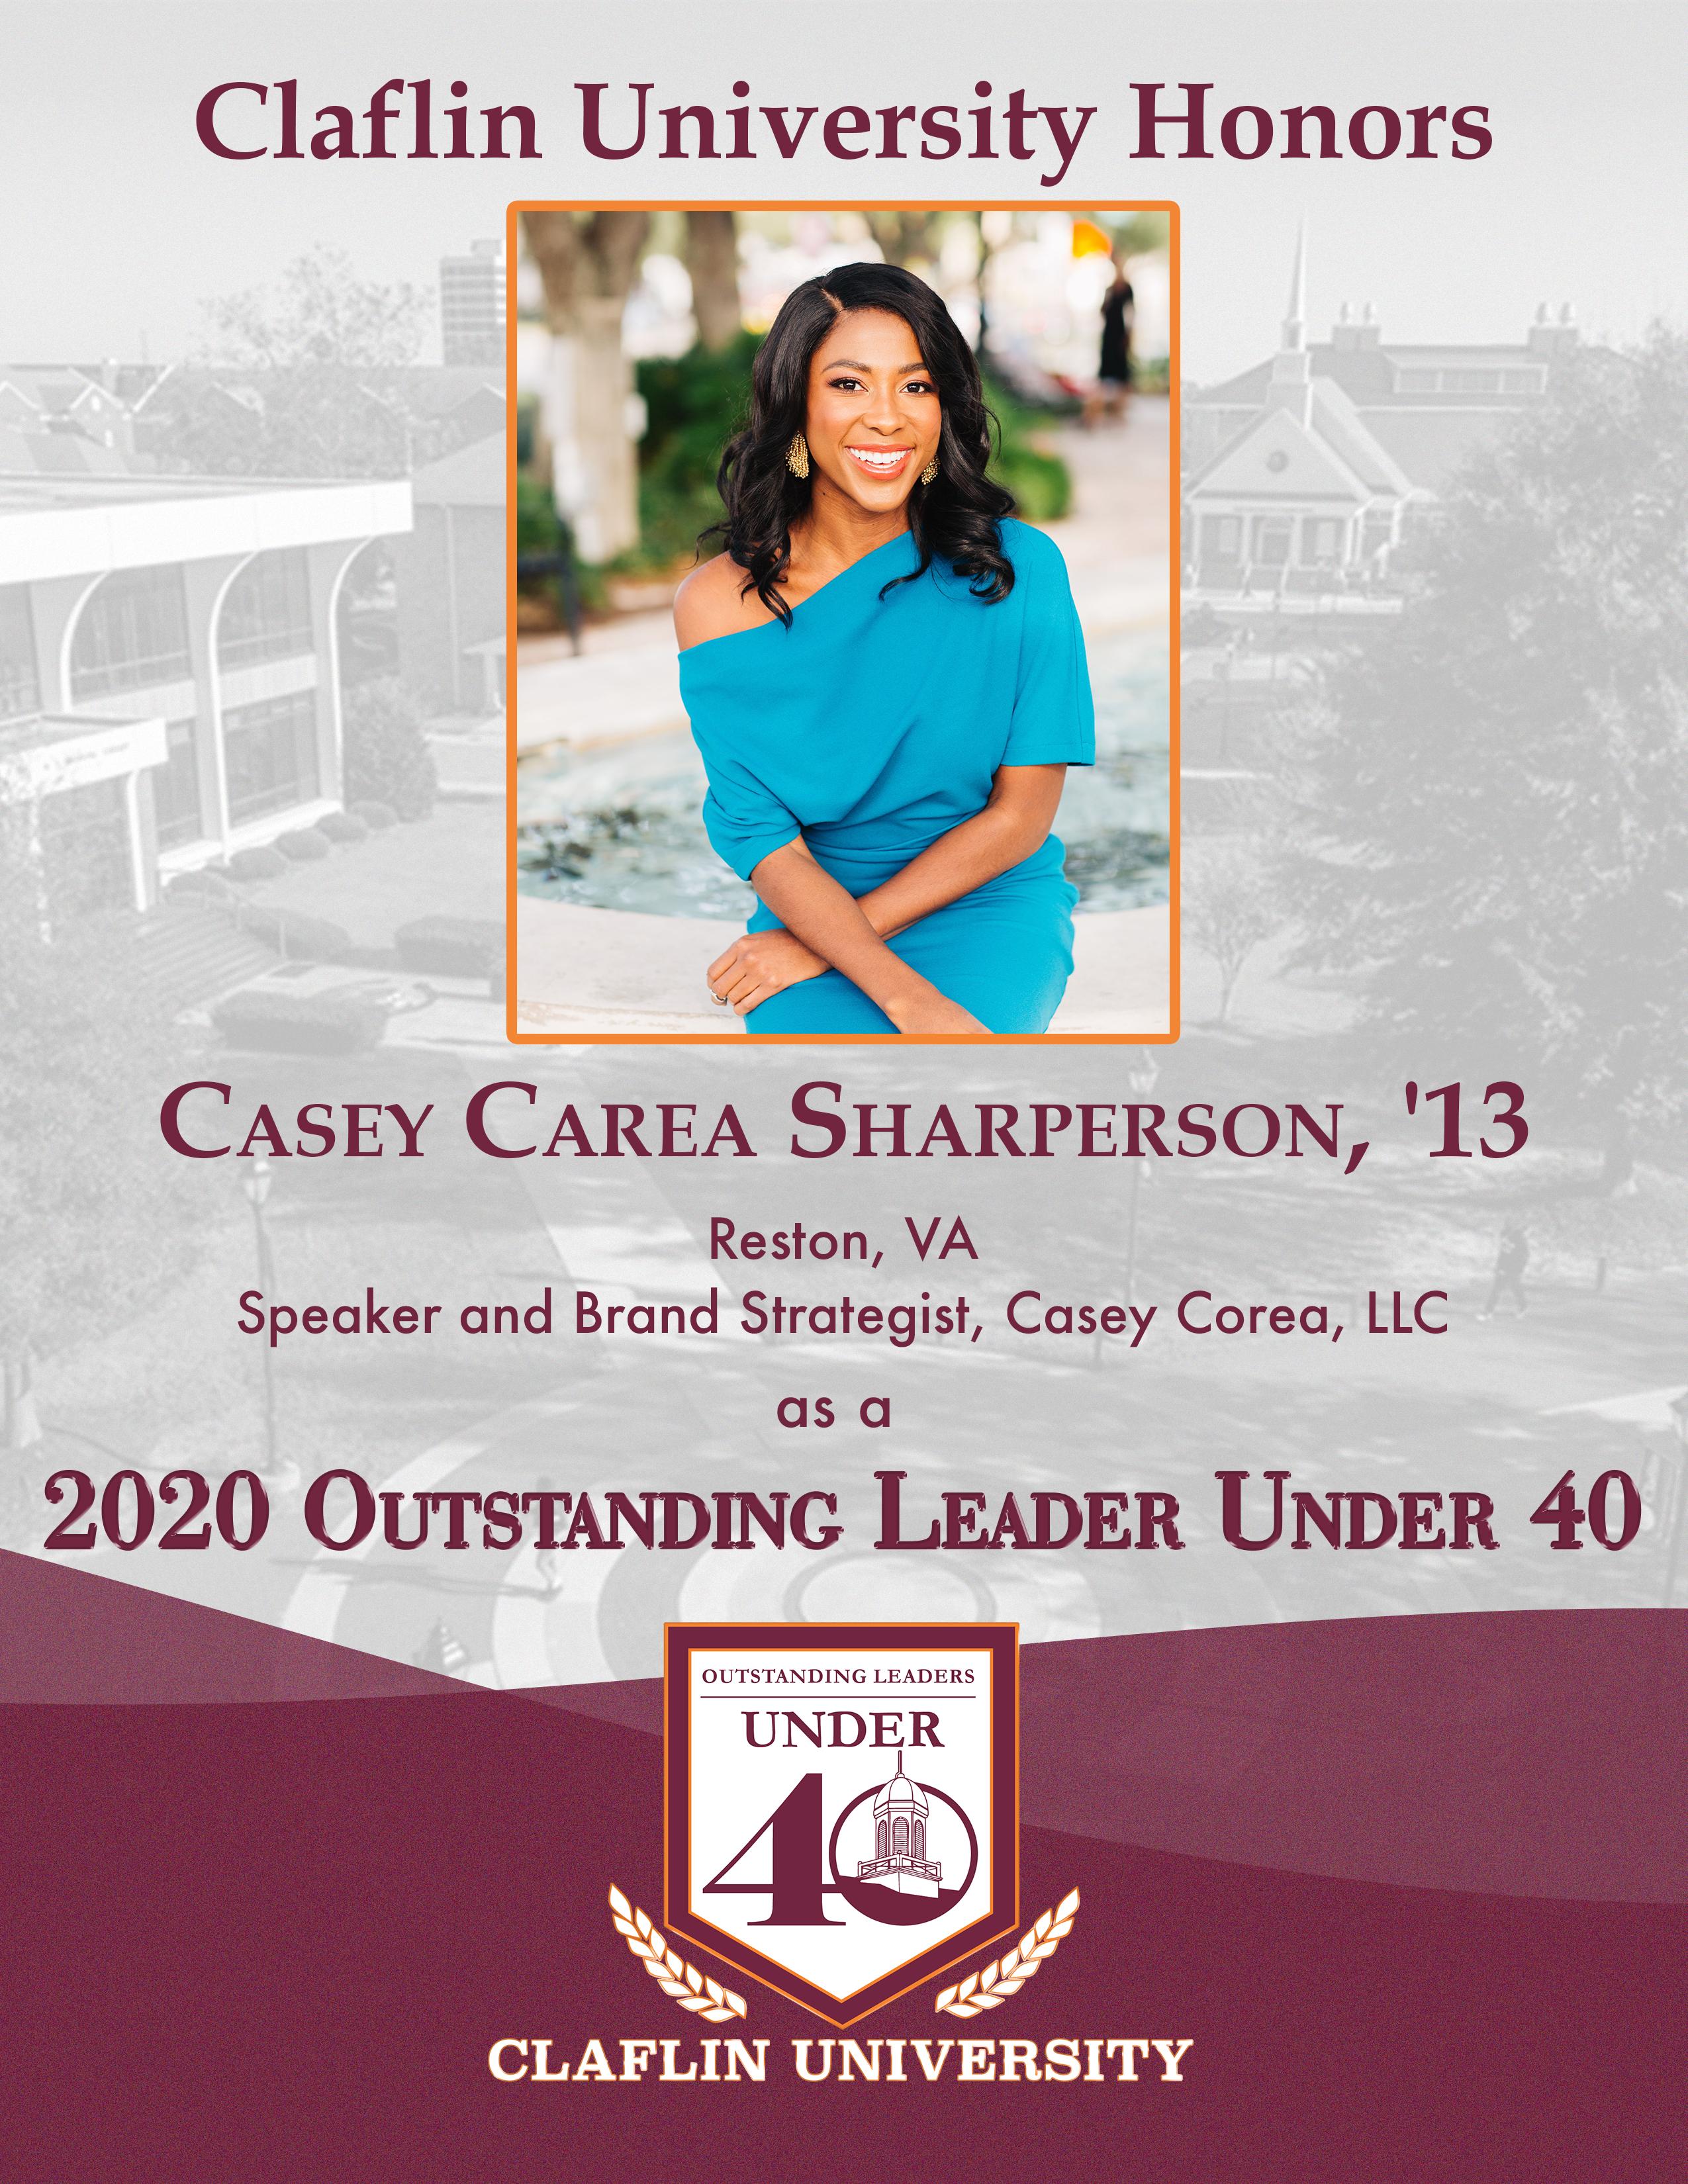 Casey Carea Sharperson